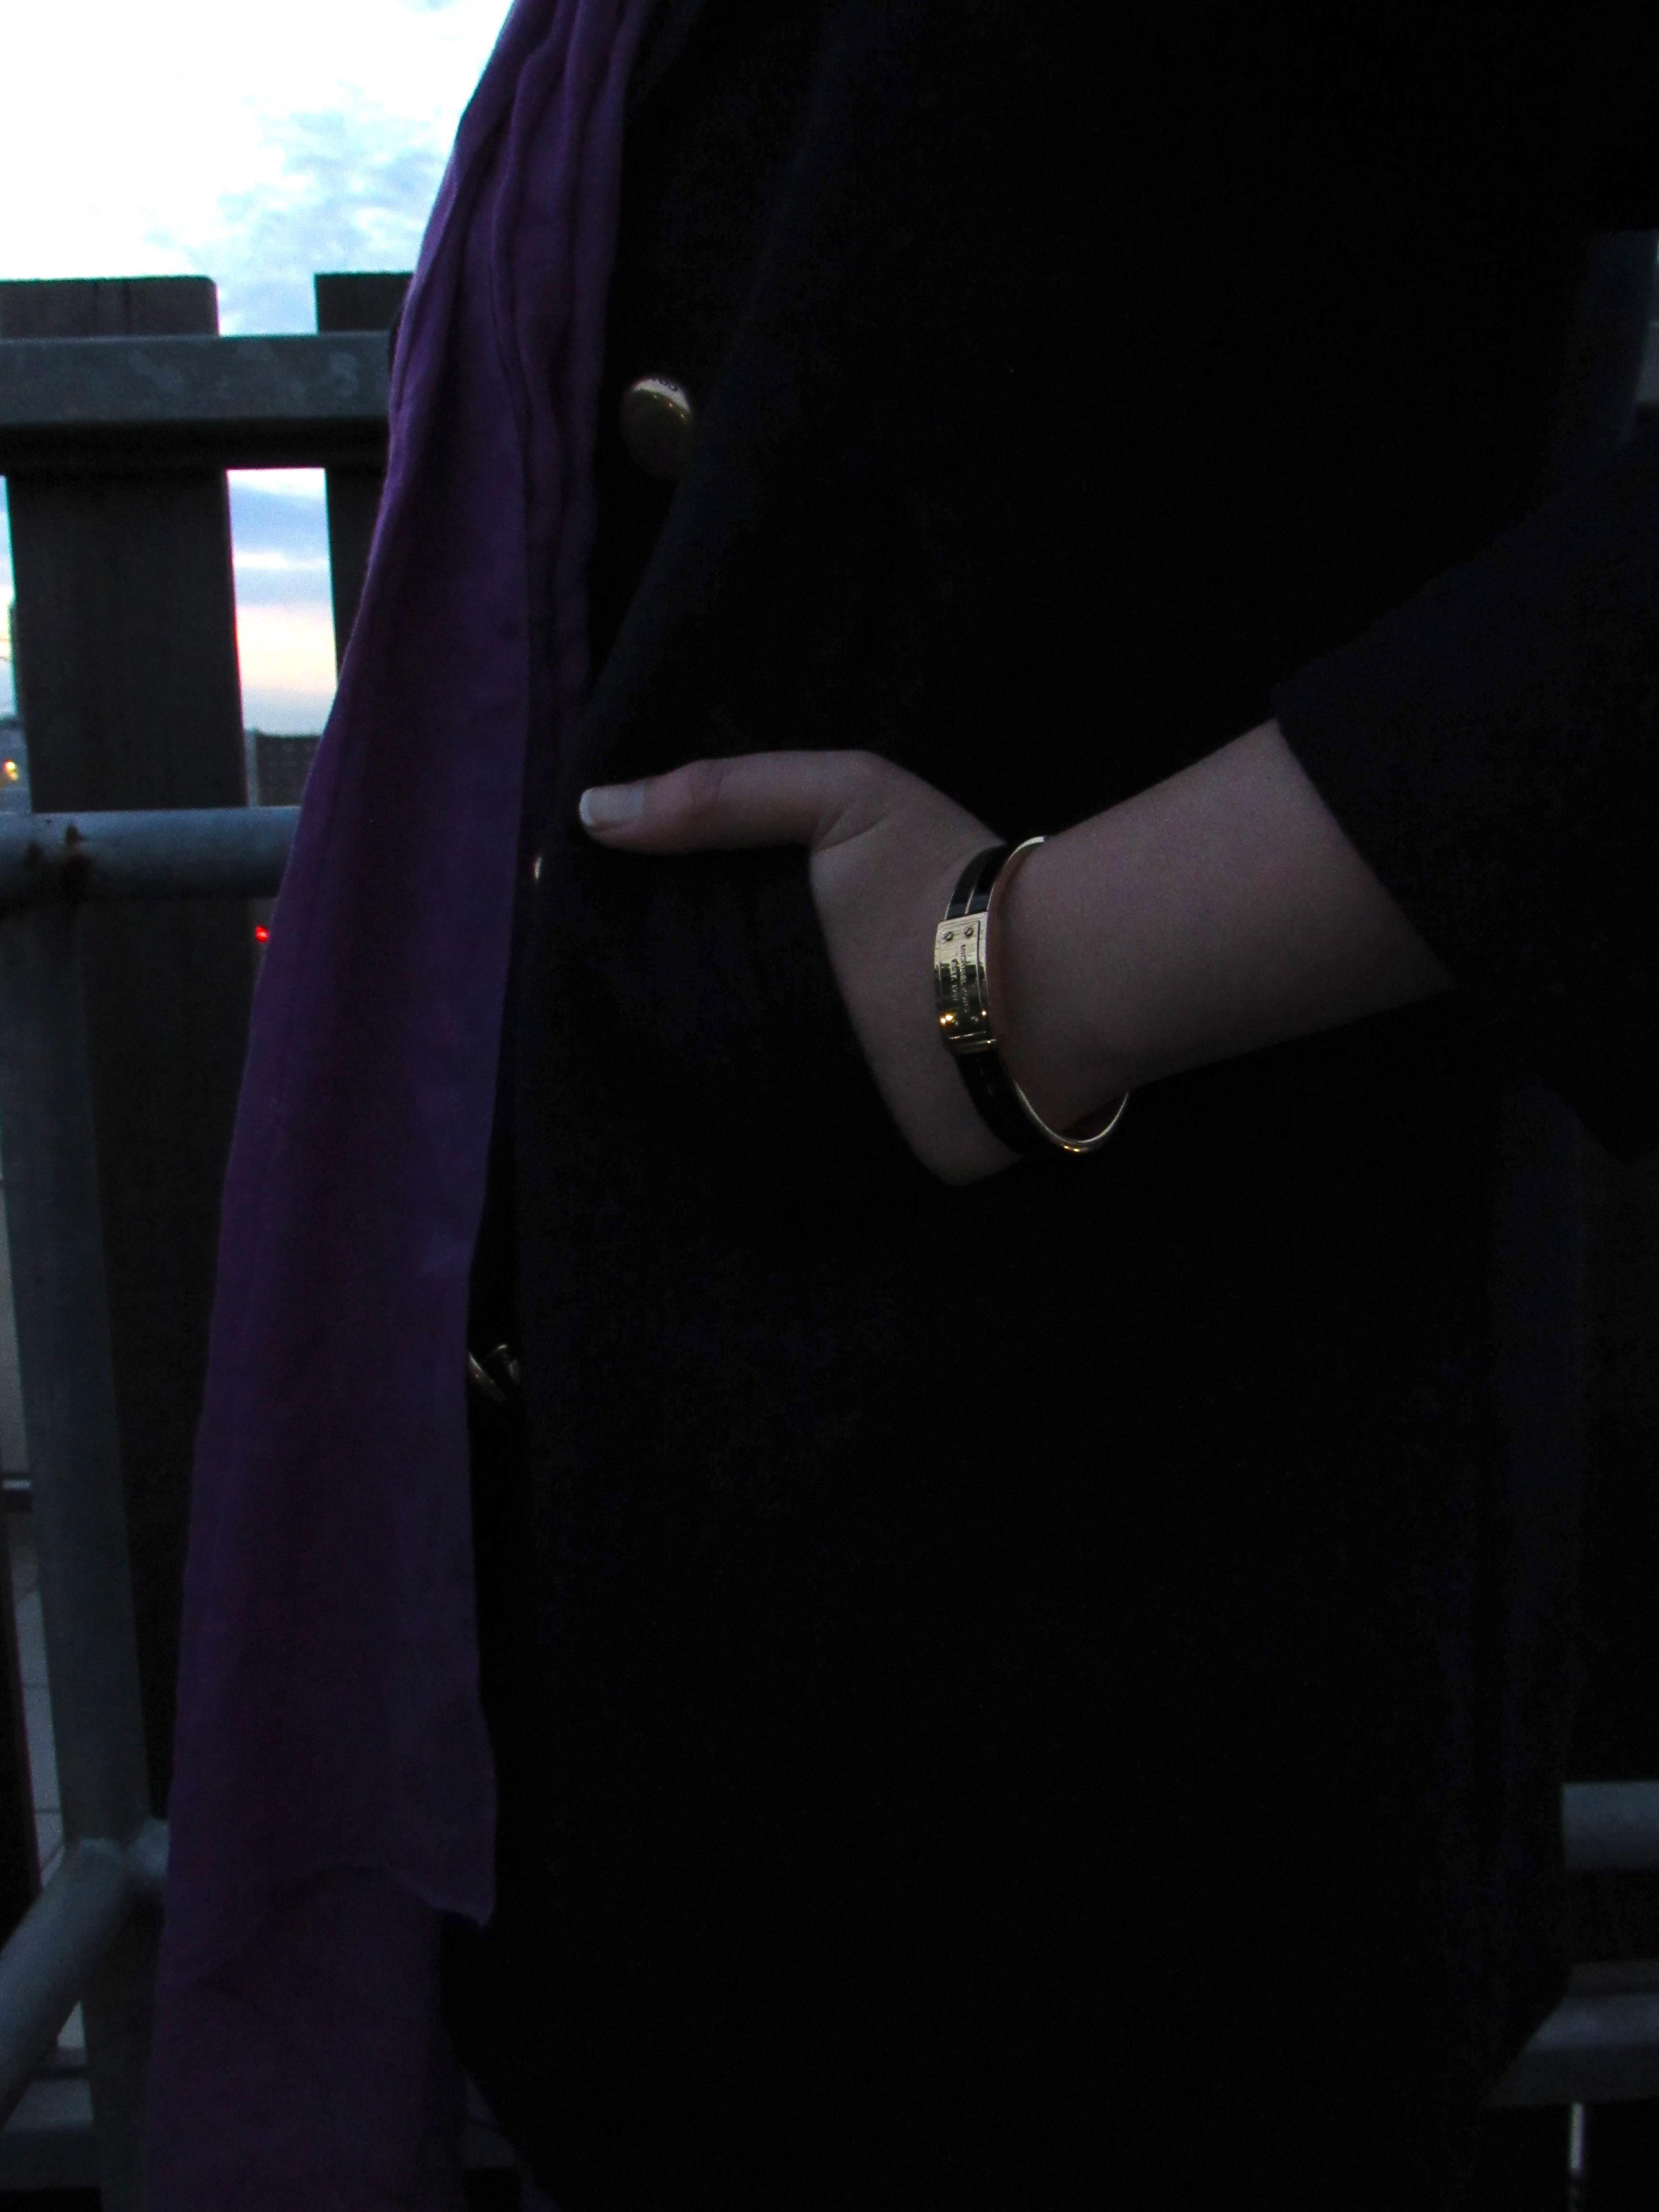 Michael Kors black and gold bangle on StylisticReaction